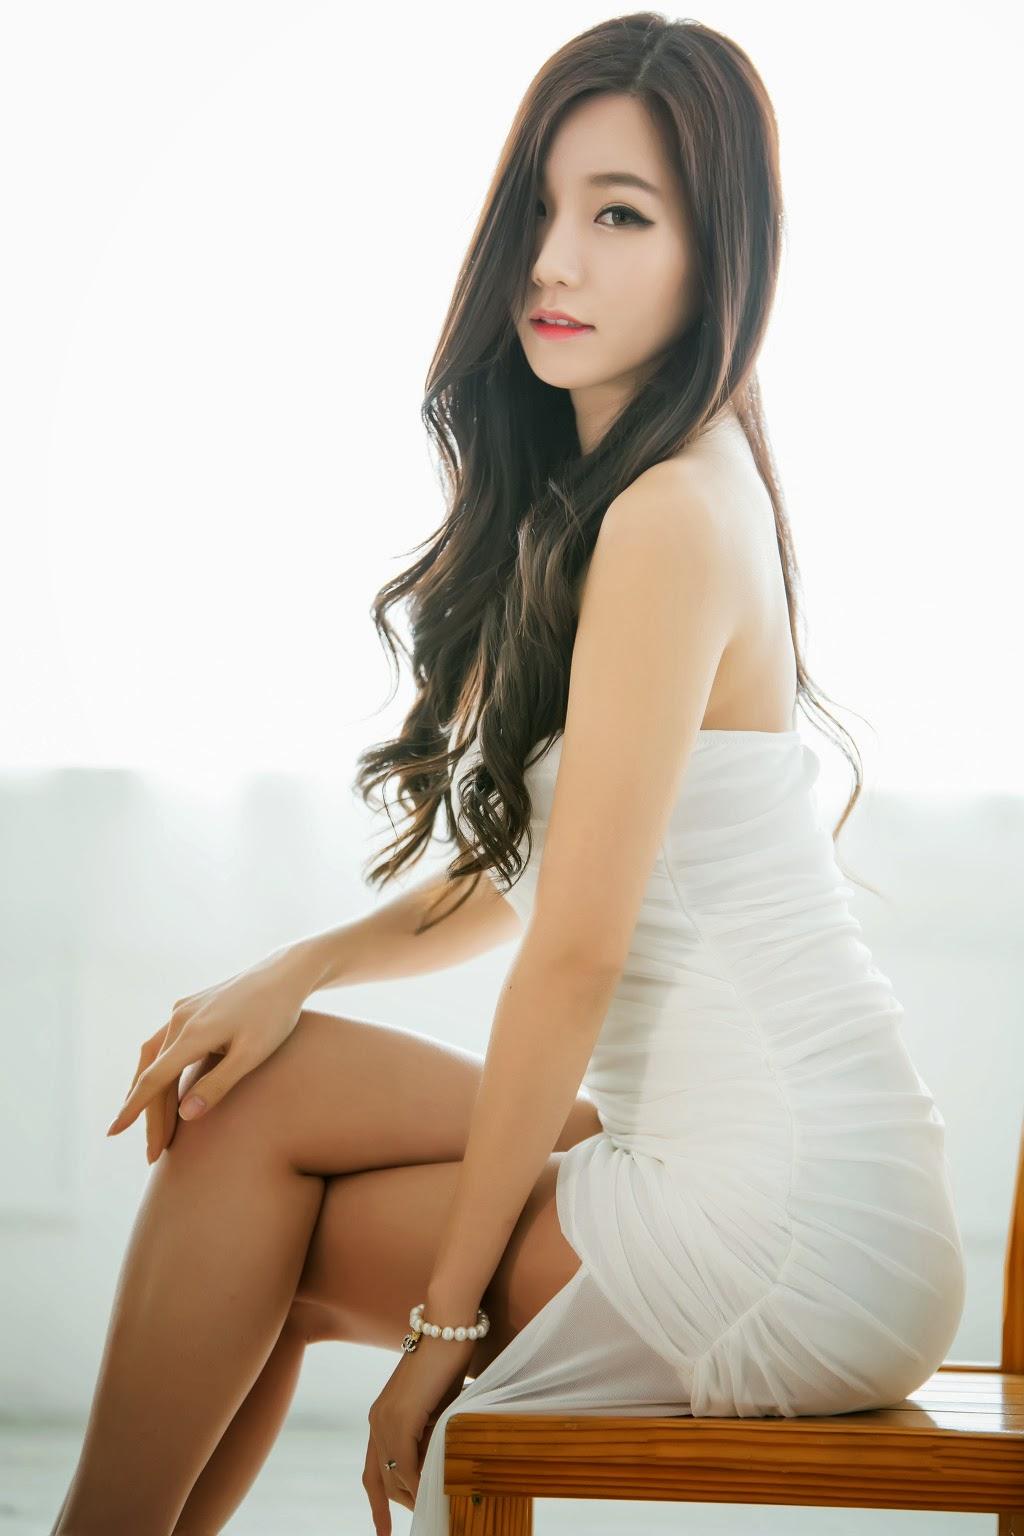 2 Lee Ji Min  - very cute asian girl-girlcute4u.blogspot.com